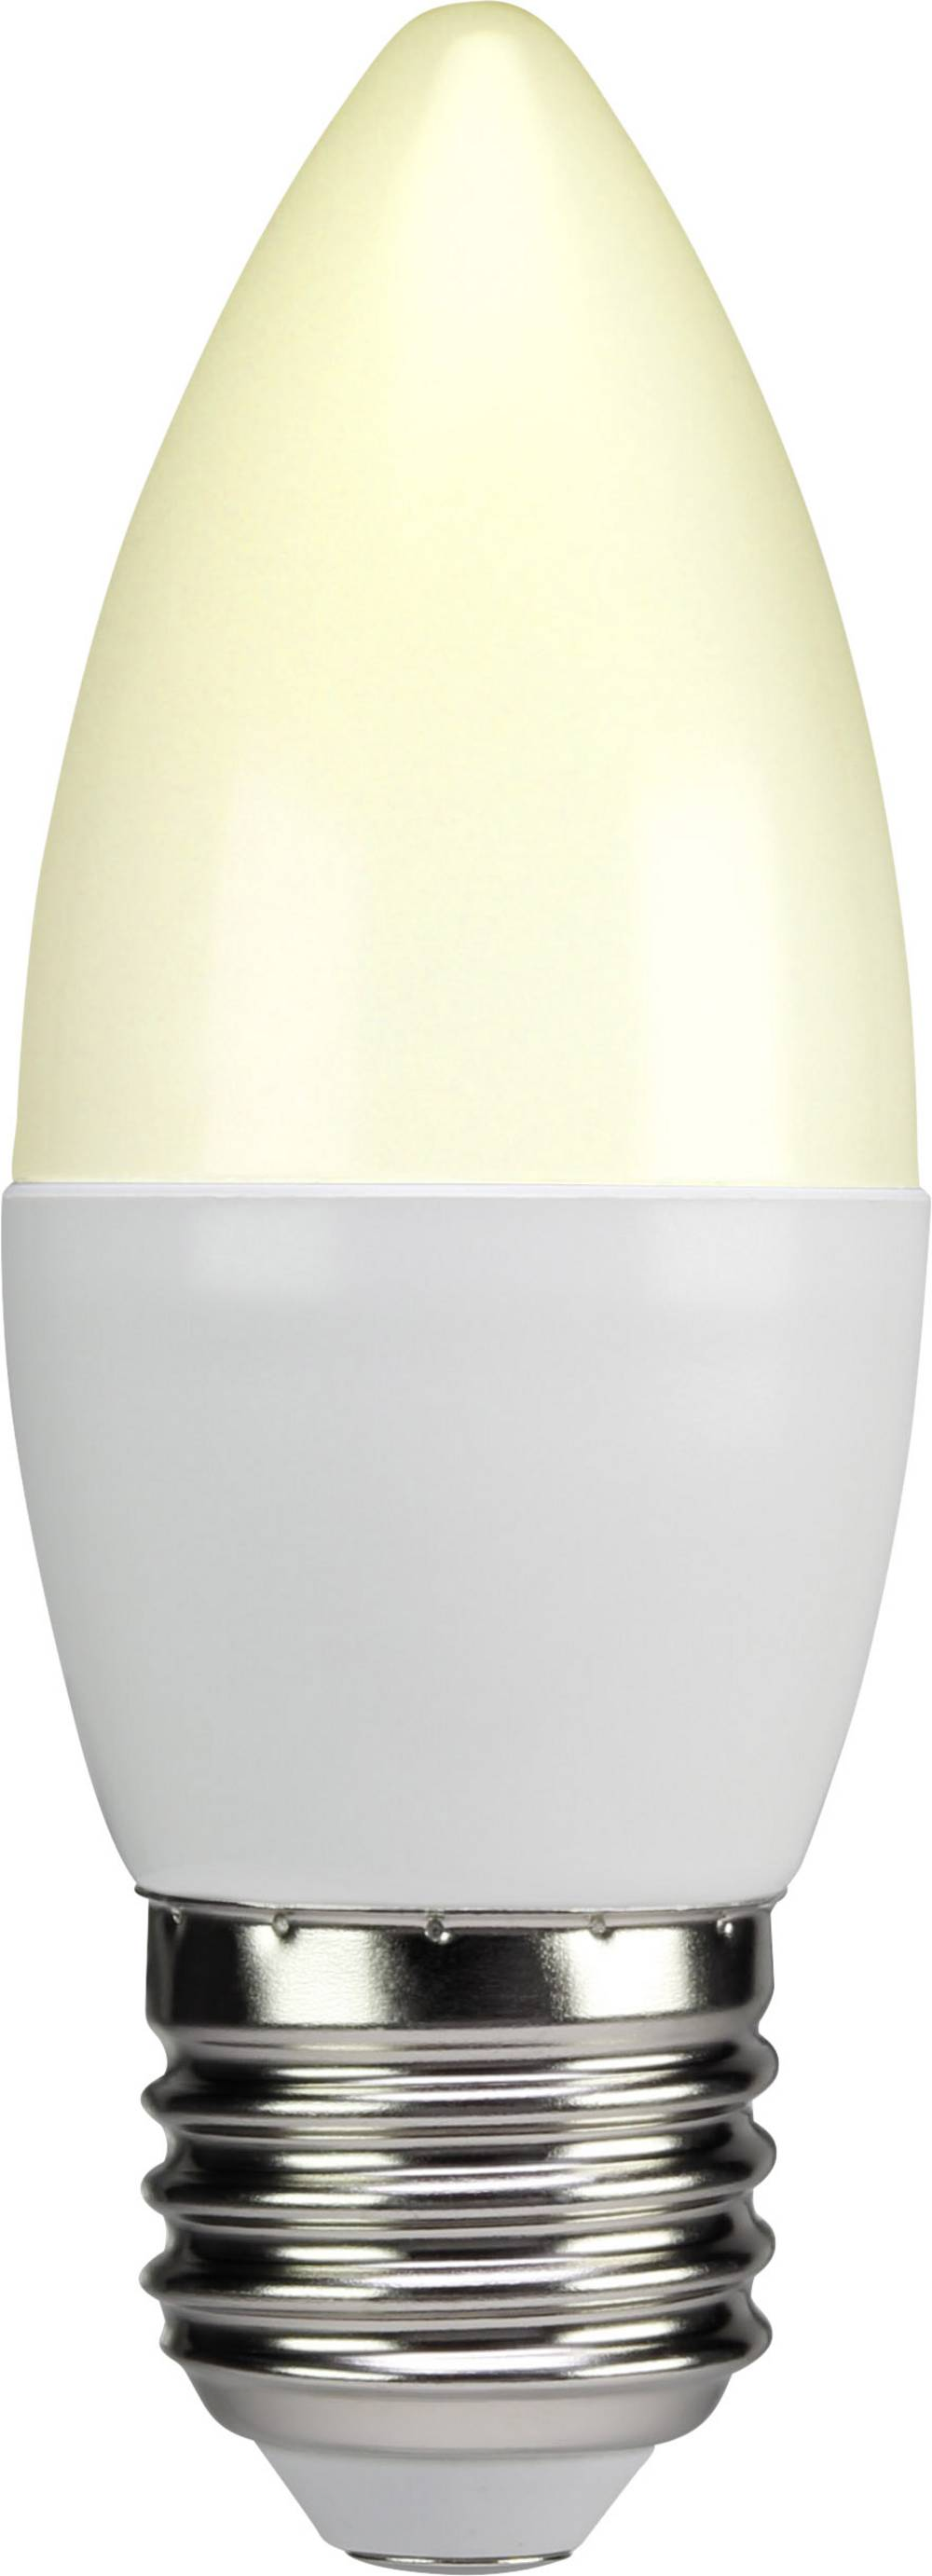 LED žarnica E27 oblika sveče 6 W = 40 W topla bela (premer x D) 38 mm x 105 mm EEK: A+ Sygonix 1 kos